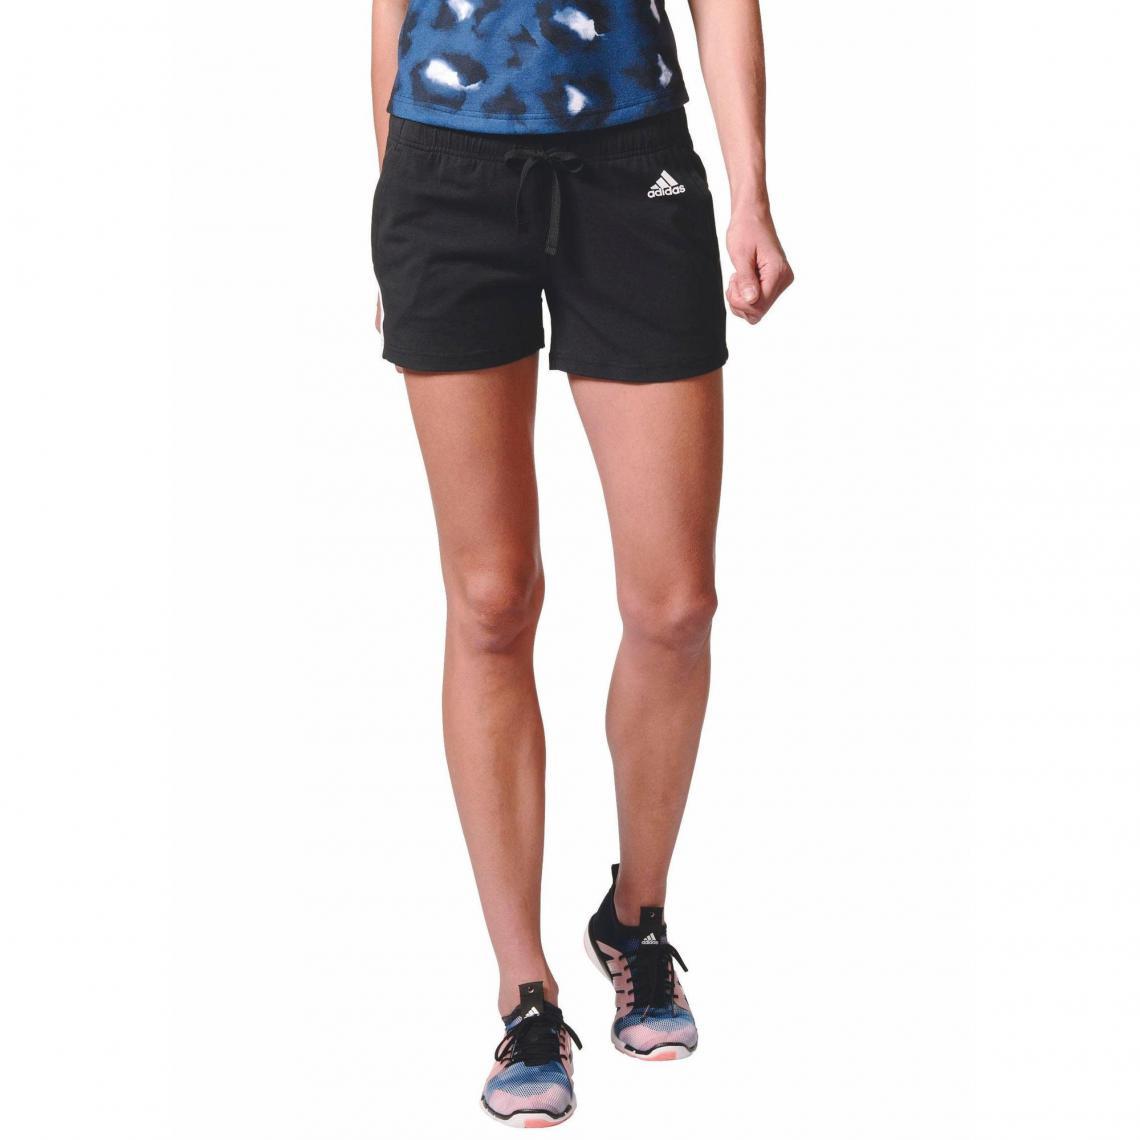 Short court femme Essentials 3 Stripes Short adidas Performance - Noir -  Blanc Adidas Performance Femme 2d8708ff5a2